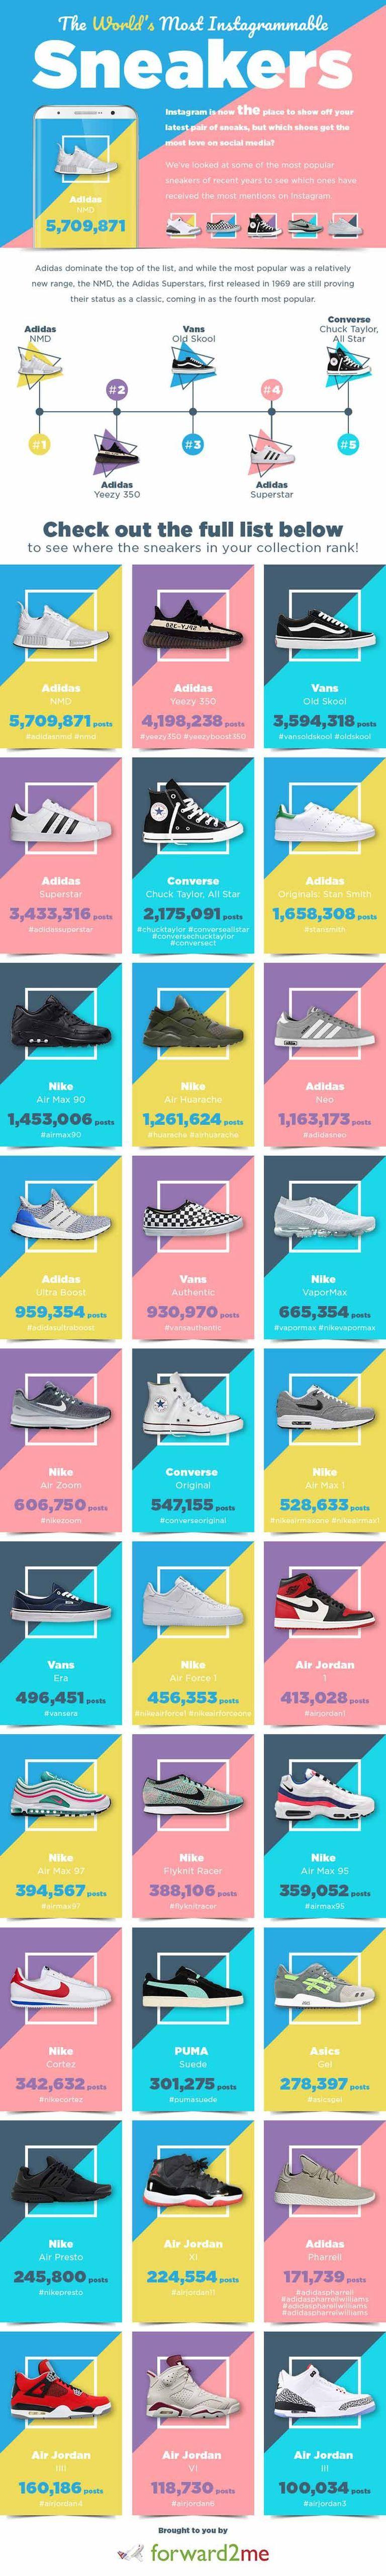 Le Adidas NMD sono le sneakers più amate al mondo